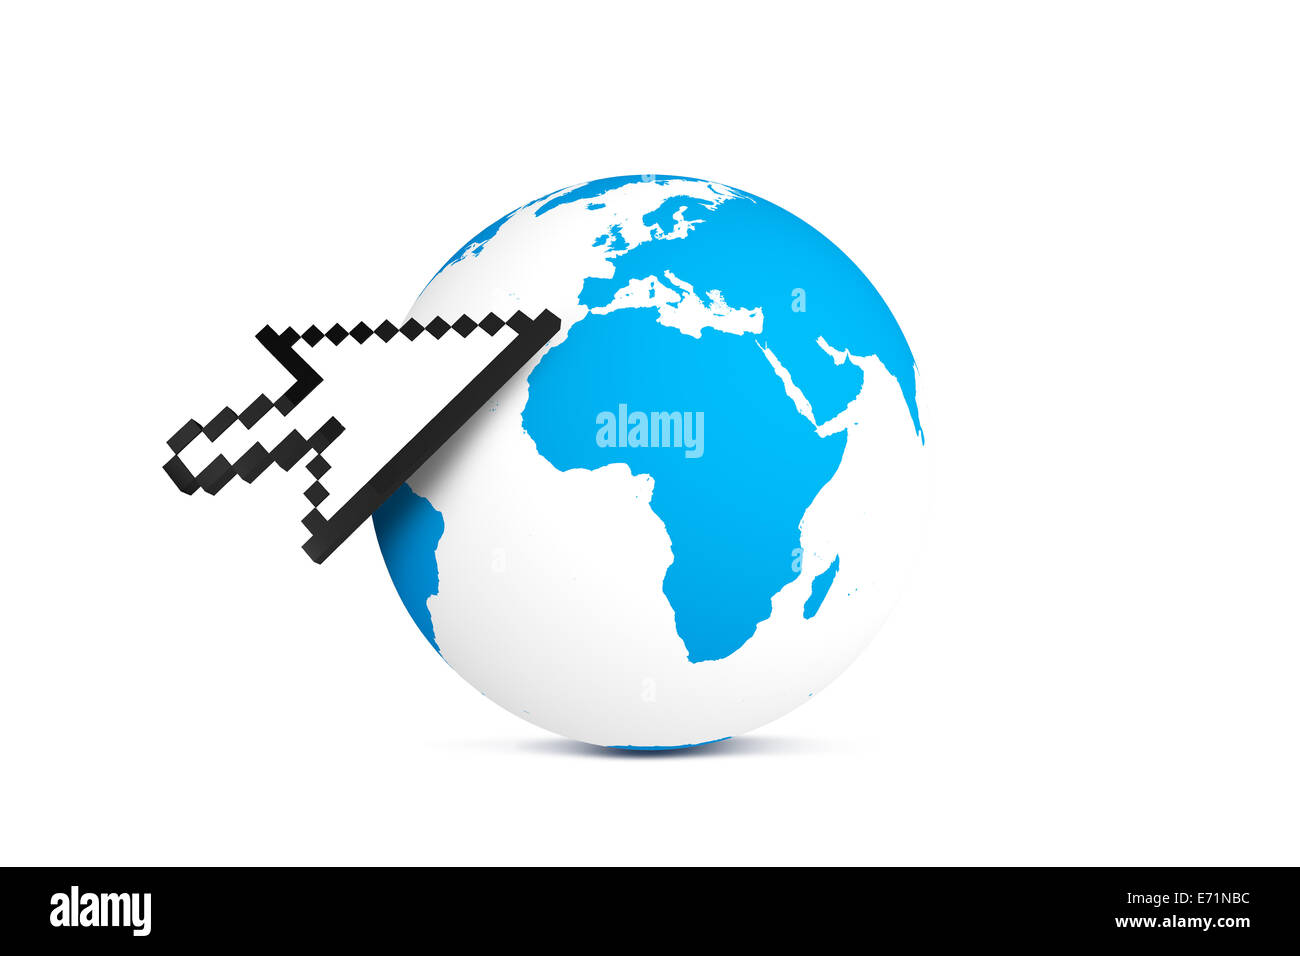 Computer mouse arrow cursor symbol pointing earth map globe ... on mod symbols, power symbols, crane symbols, sport symbols, baltimore symbols, cd symbols, race symbols, state symbols, real symbols, cook symbols,